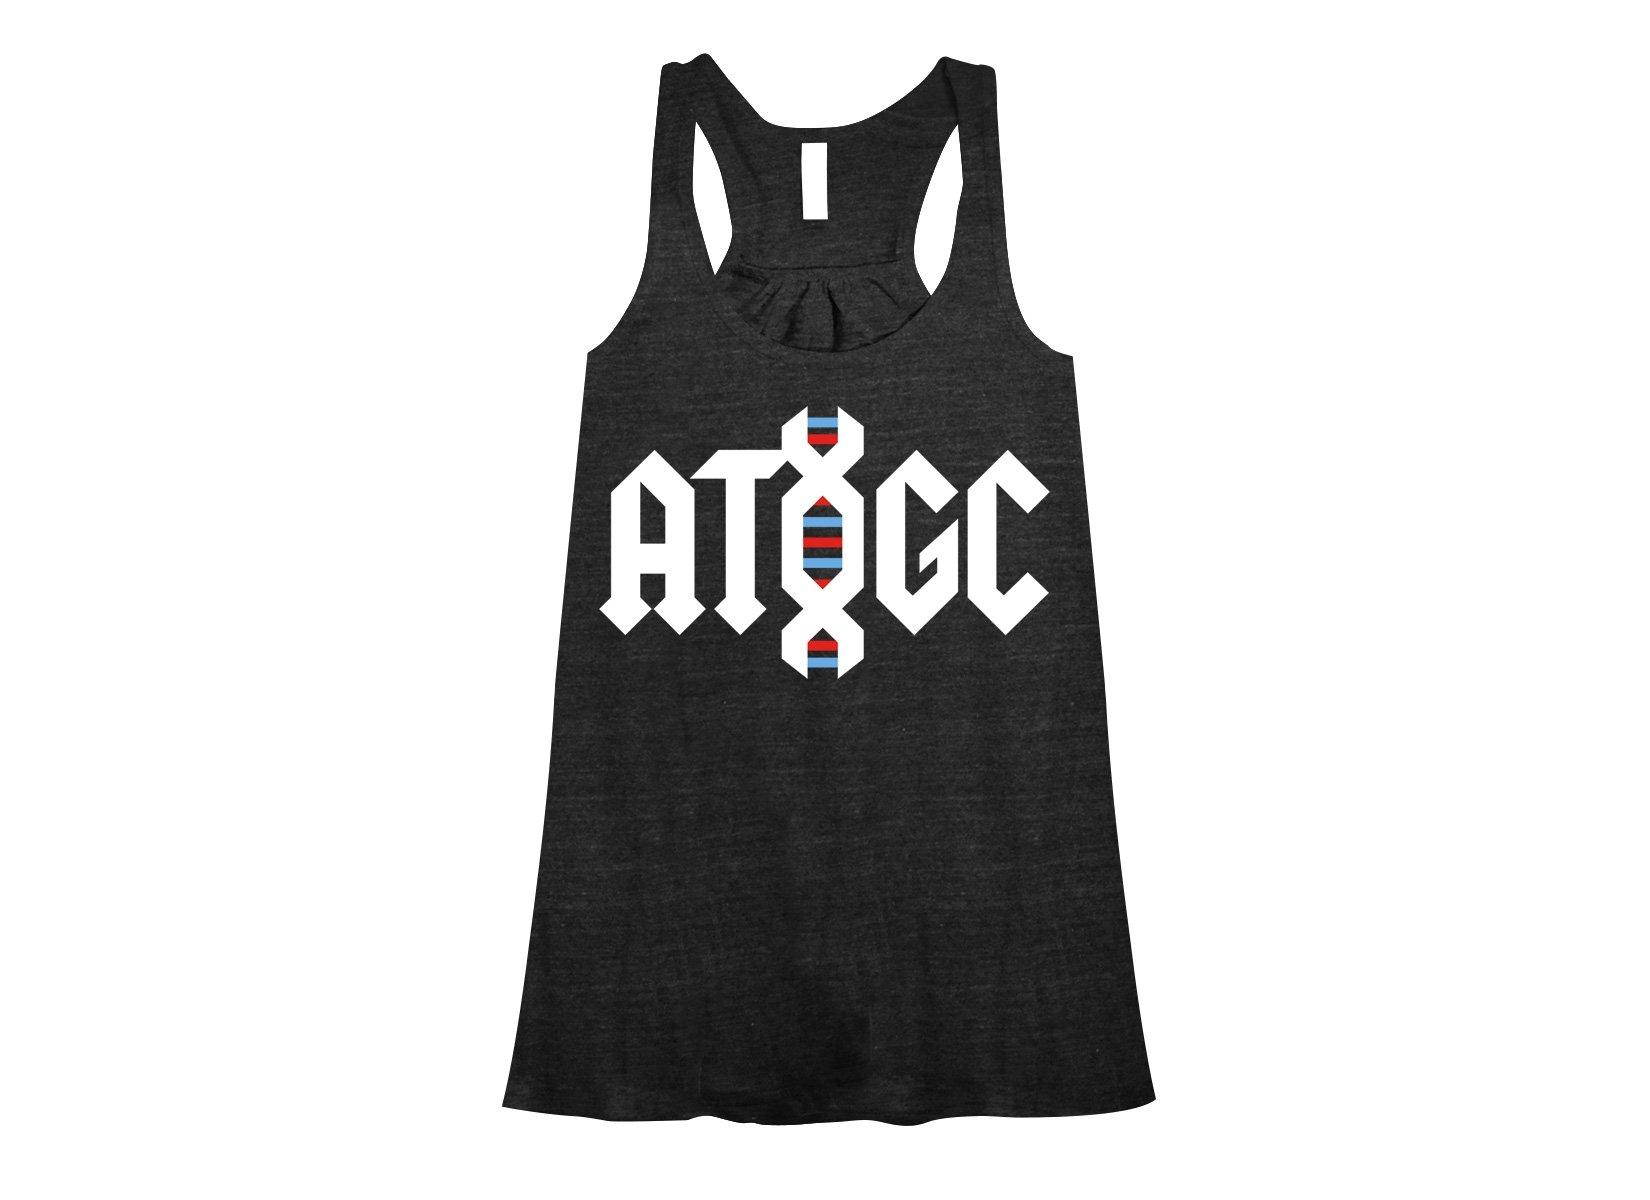 ATGC DNA on Womens Tanks T-Shirt